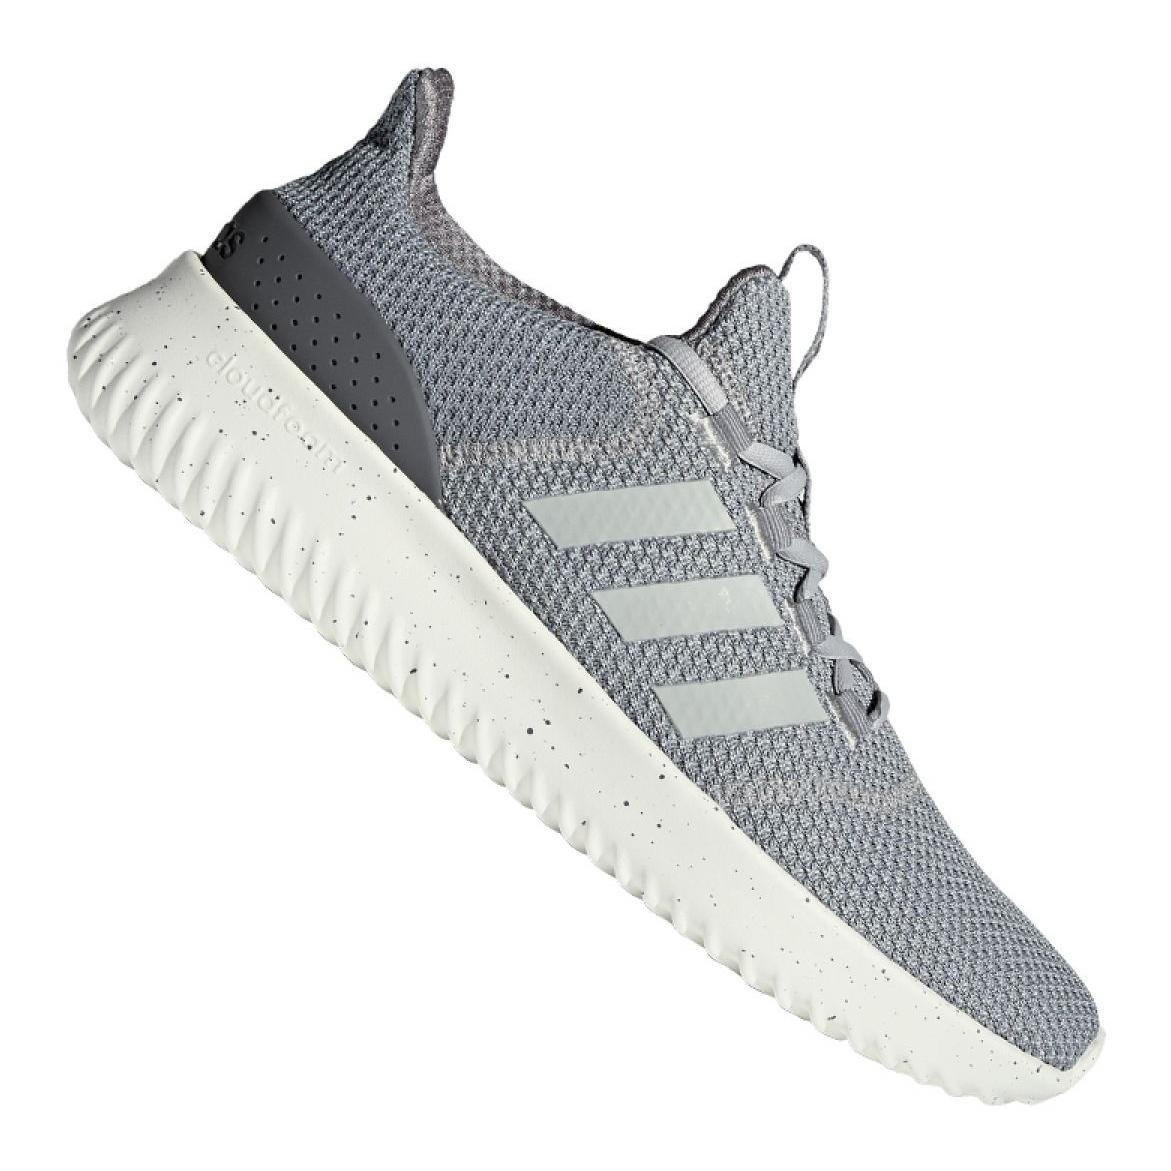 Adidas Cloudfoam Ultimate M F34455 shoes grey